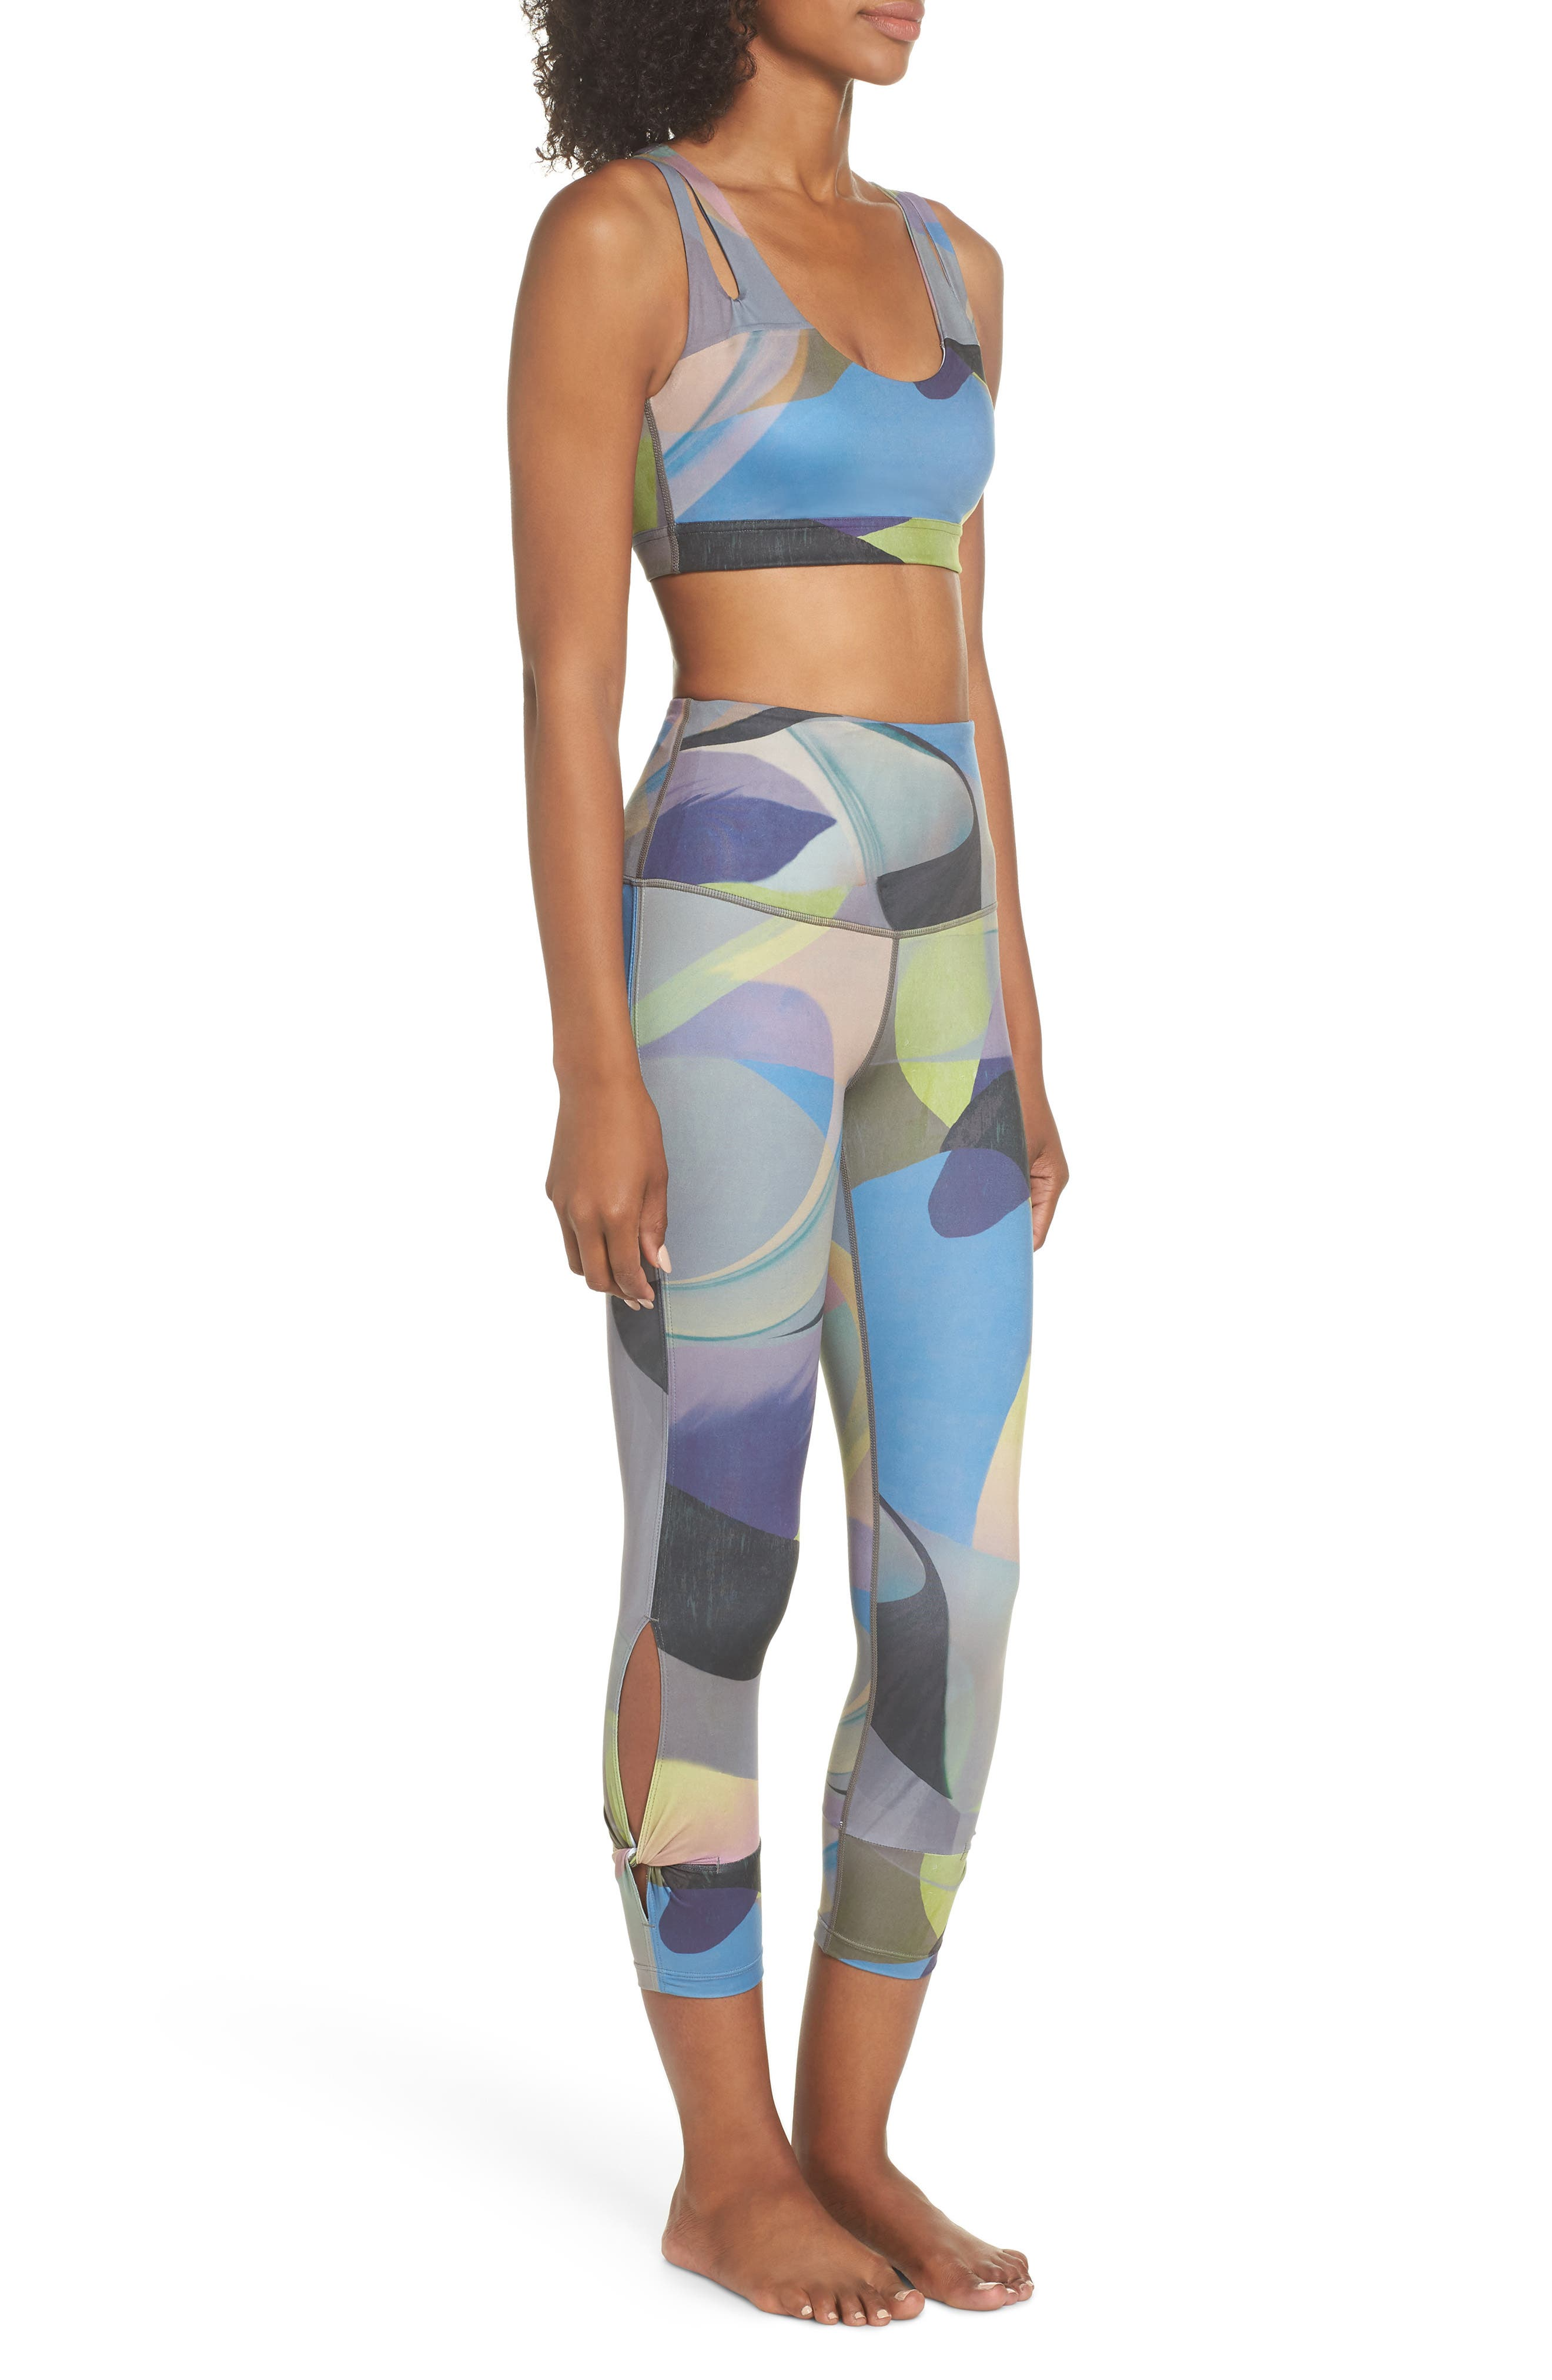 Katya High Waist Abstract Print Recycled Crop Leggings,                             Alternate thumbnail 10, color,                             GREY URBAN ABSTRACT BOTANICAL